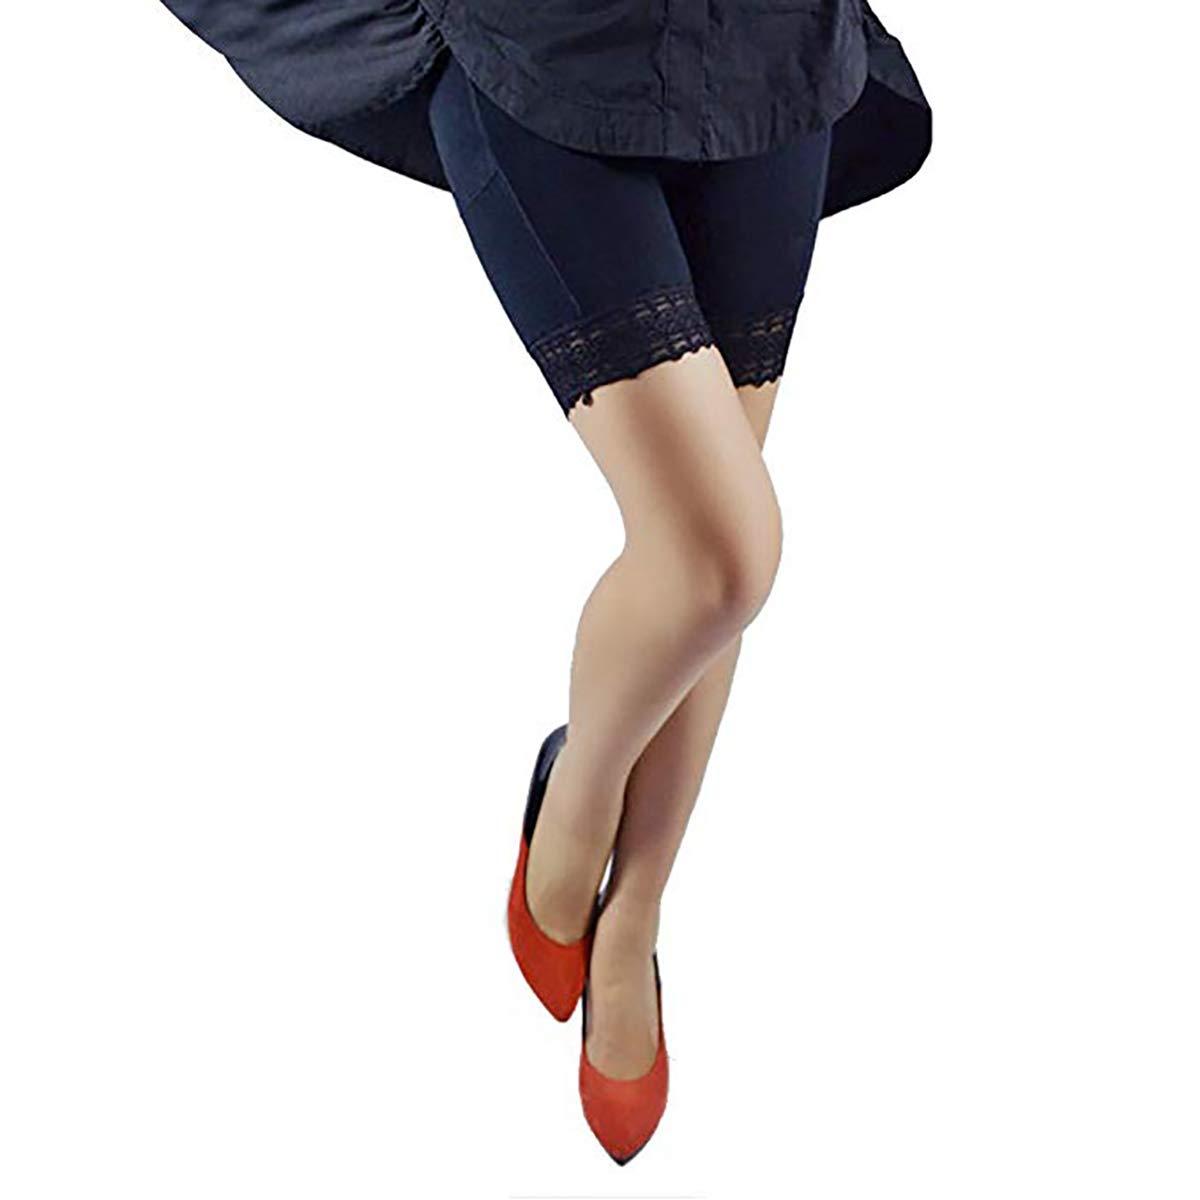 FF1 Women High Waist Elastic Panty Short Legging with Phone Pocket